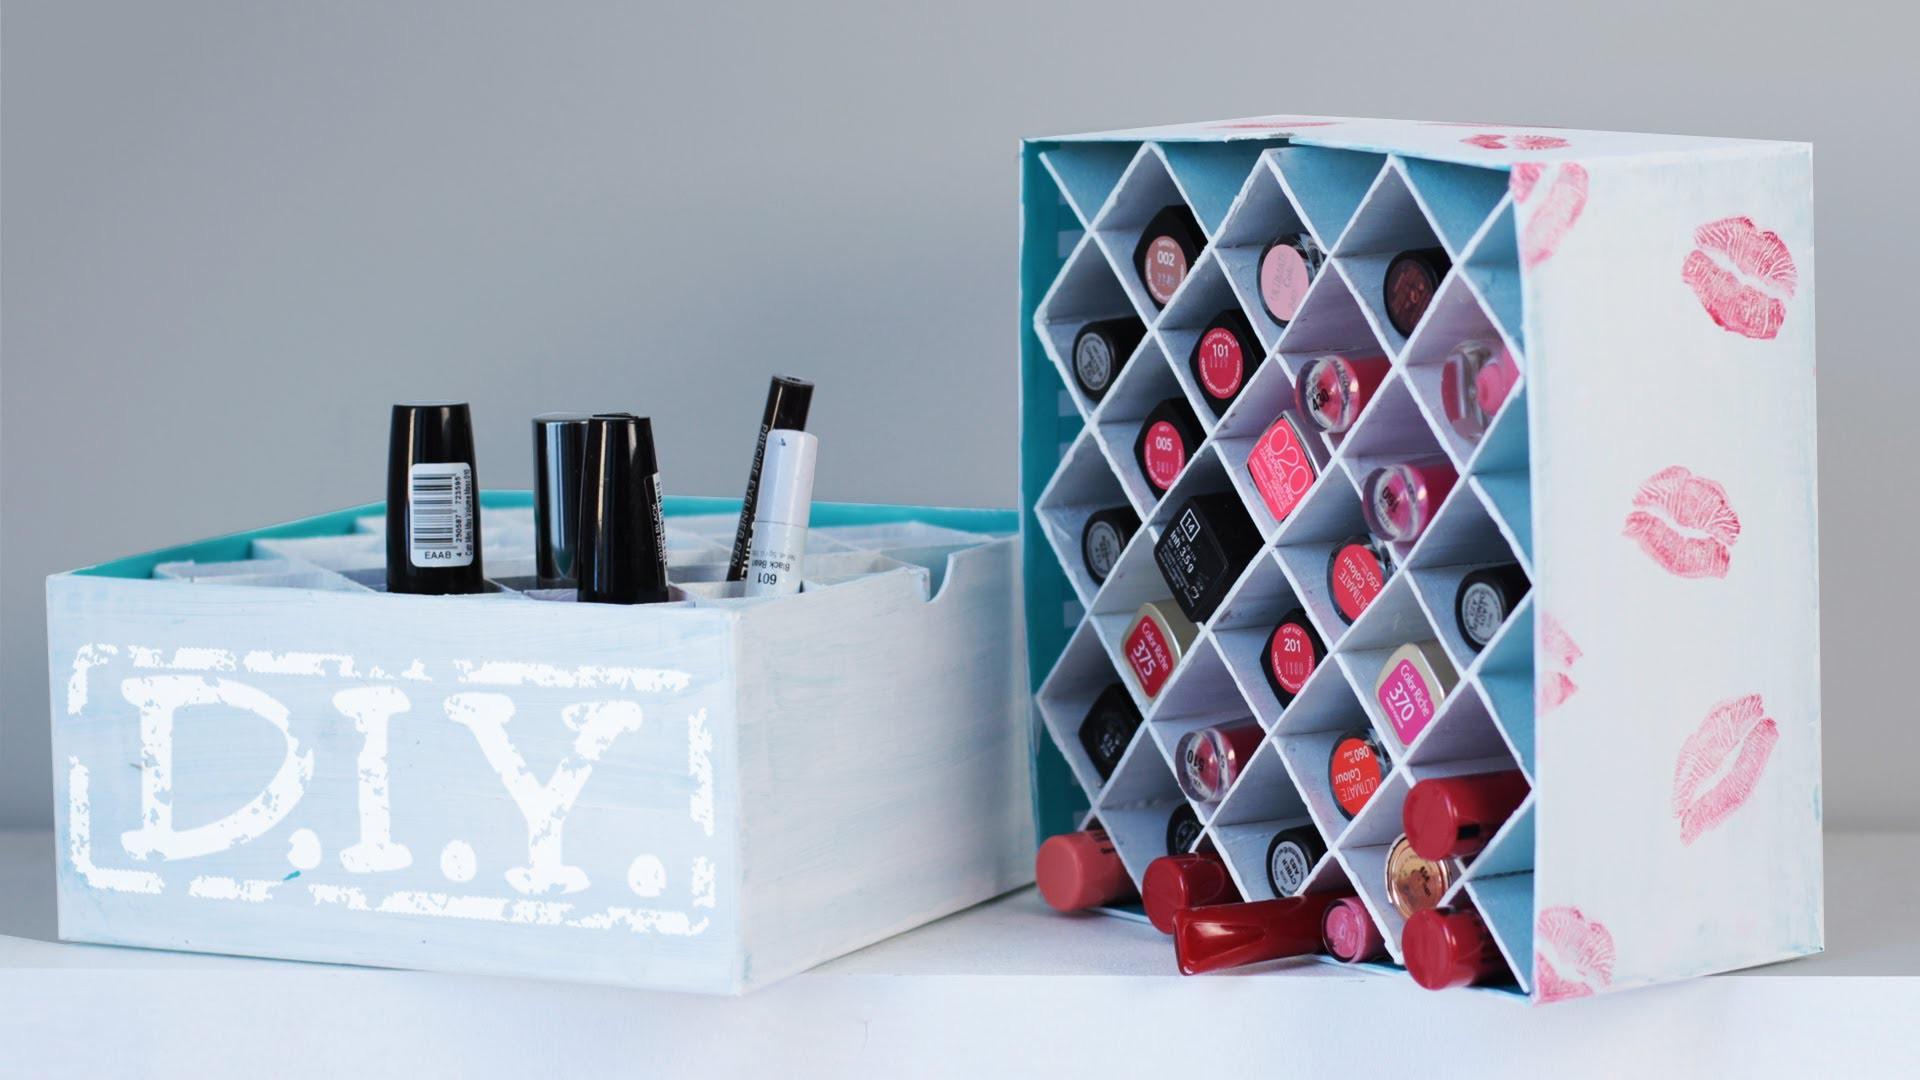 Make Up Aufbewahrung Diy  DIY Makeup Aufbewahrung Lippenstift Box Deko